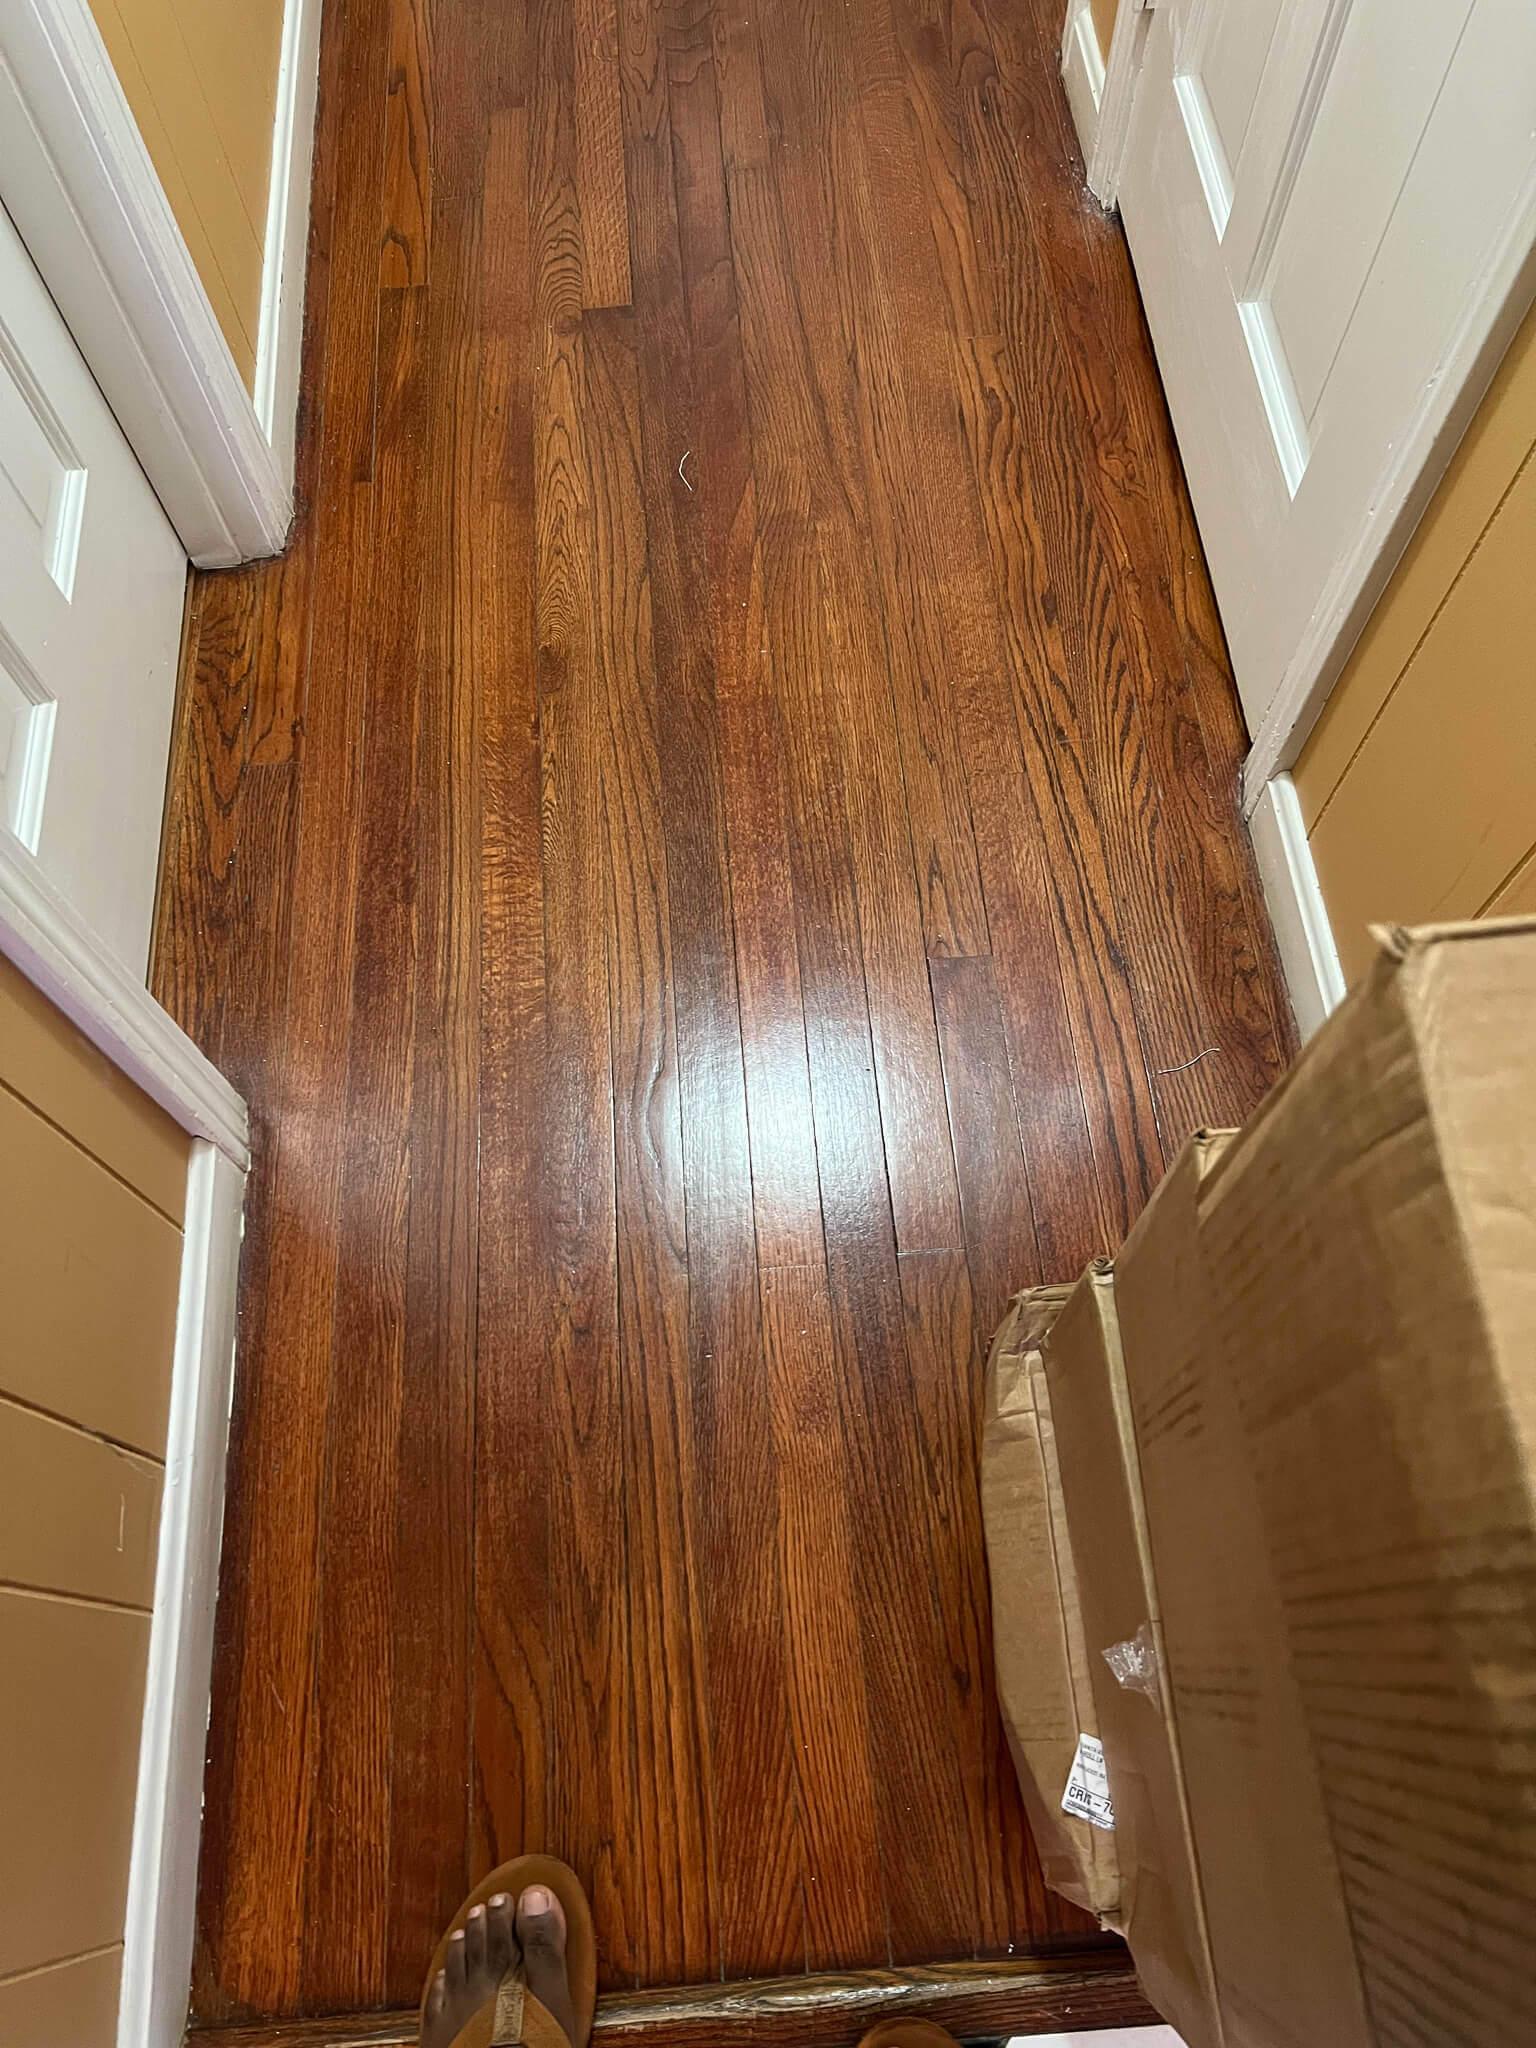 dull looking hardwood floor